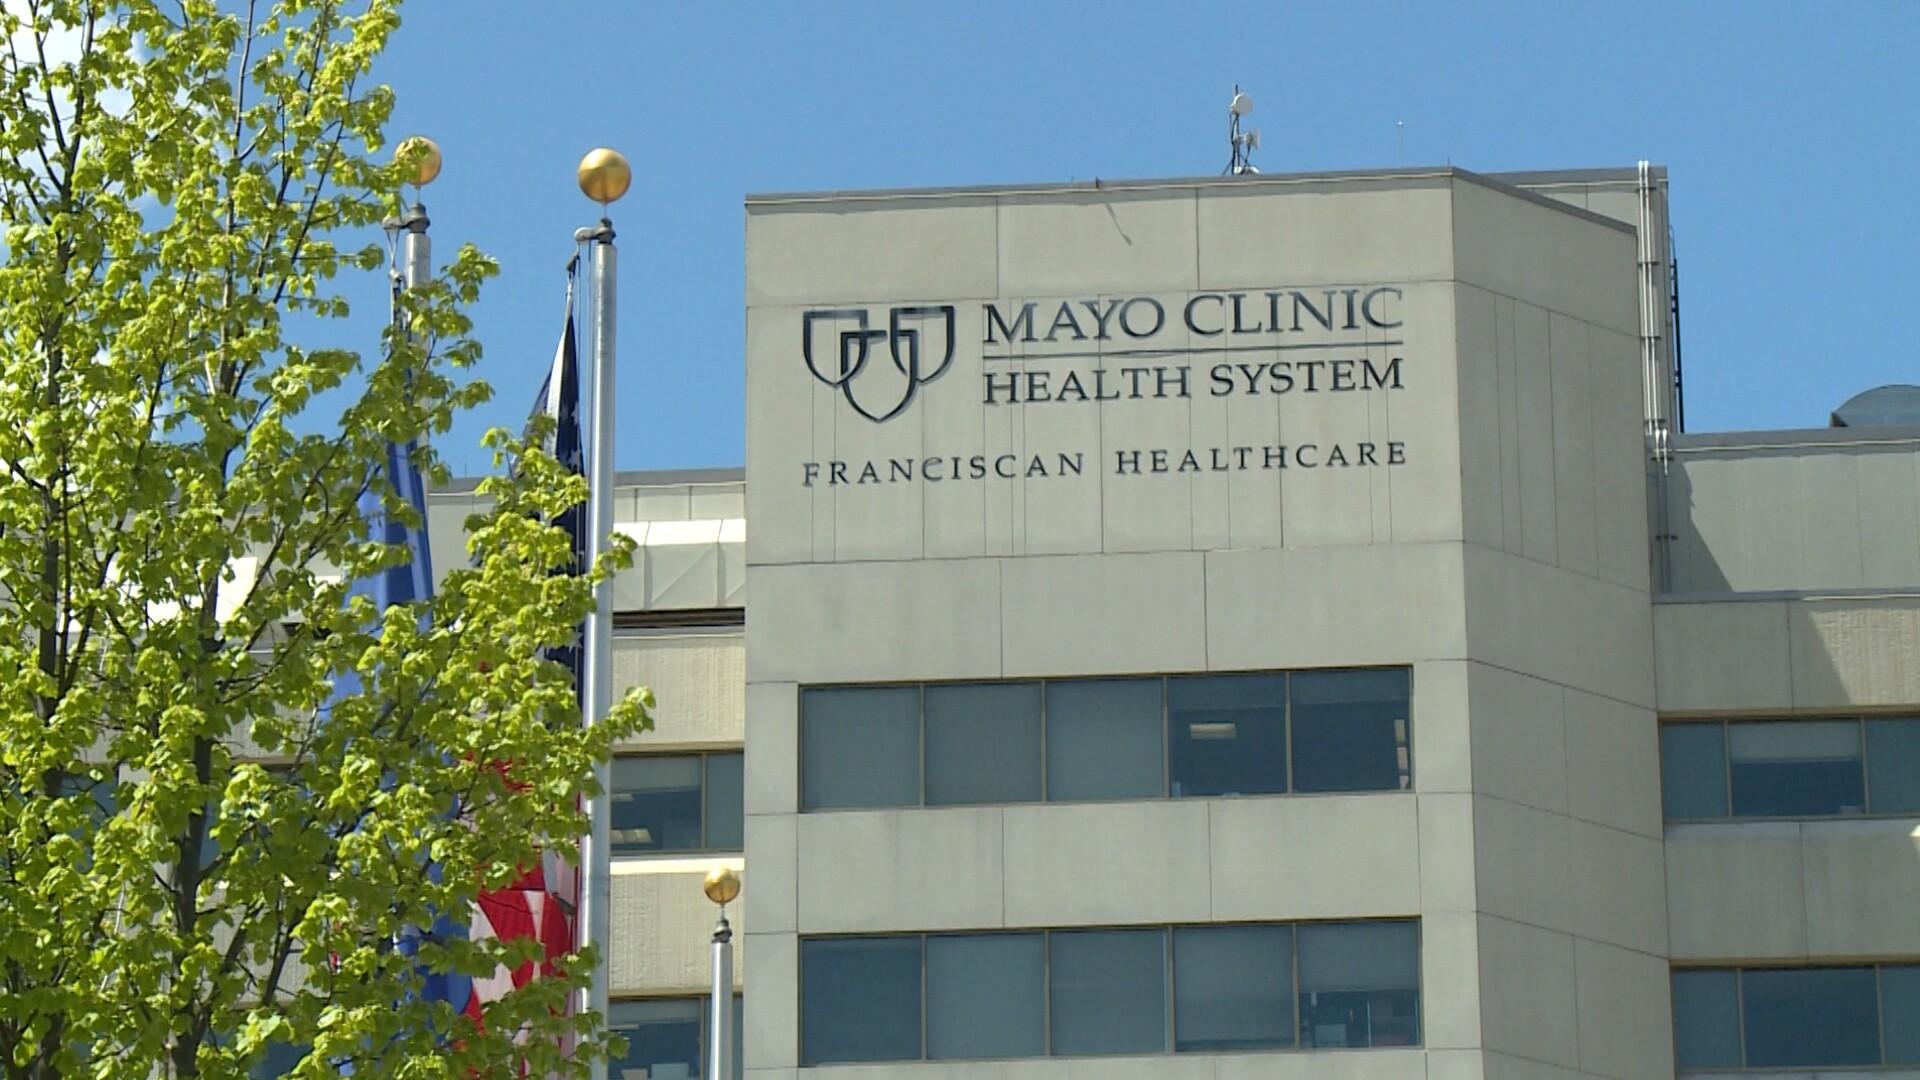 Mayo Clinic Franciscan Healthcare in La Crosse